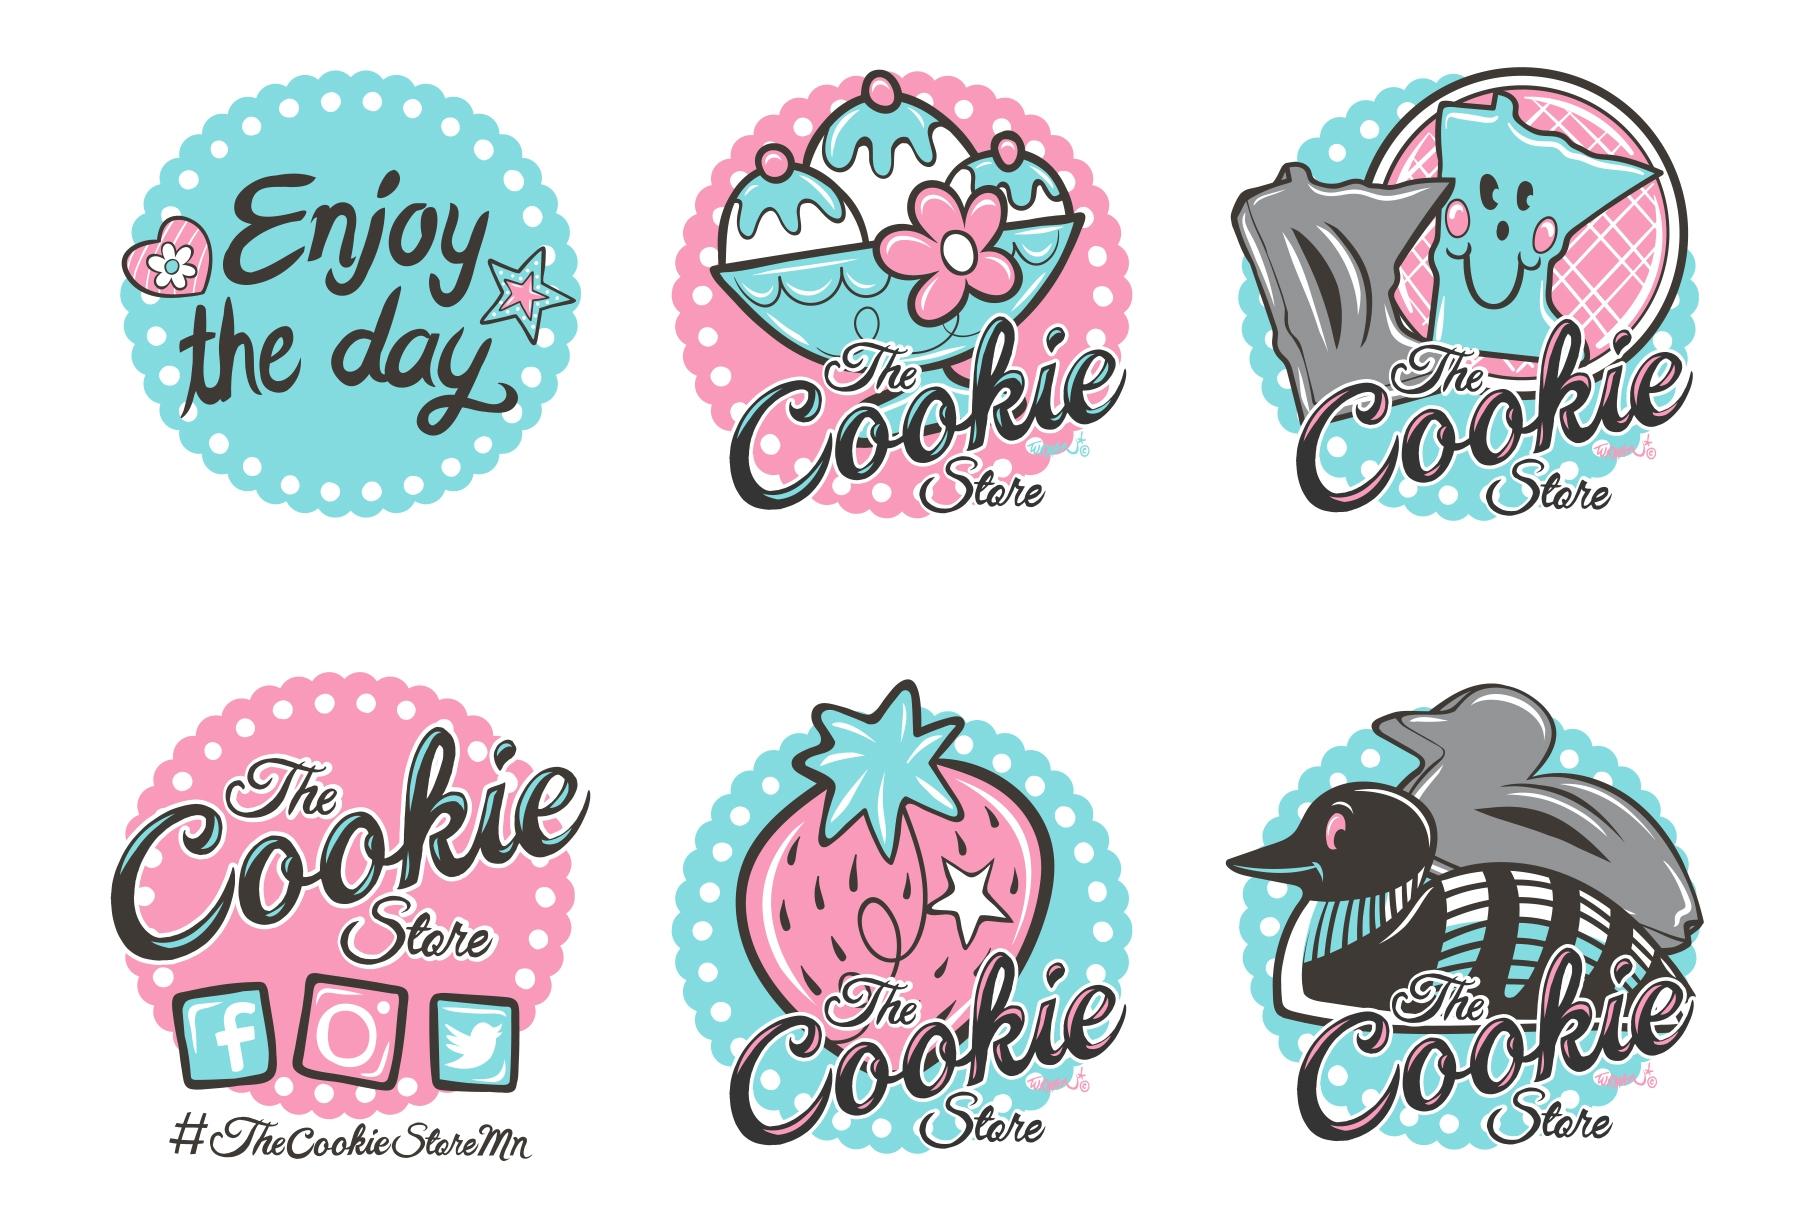 TheCookieStore_VariousGraphics.jpg